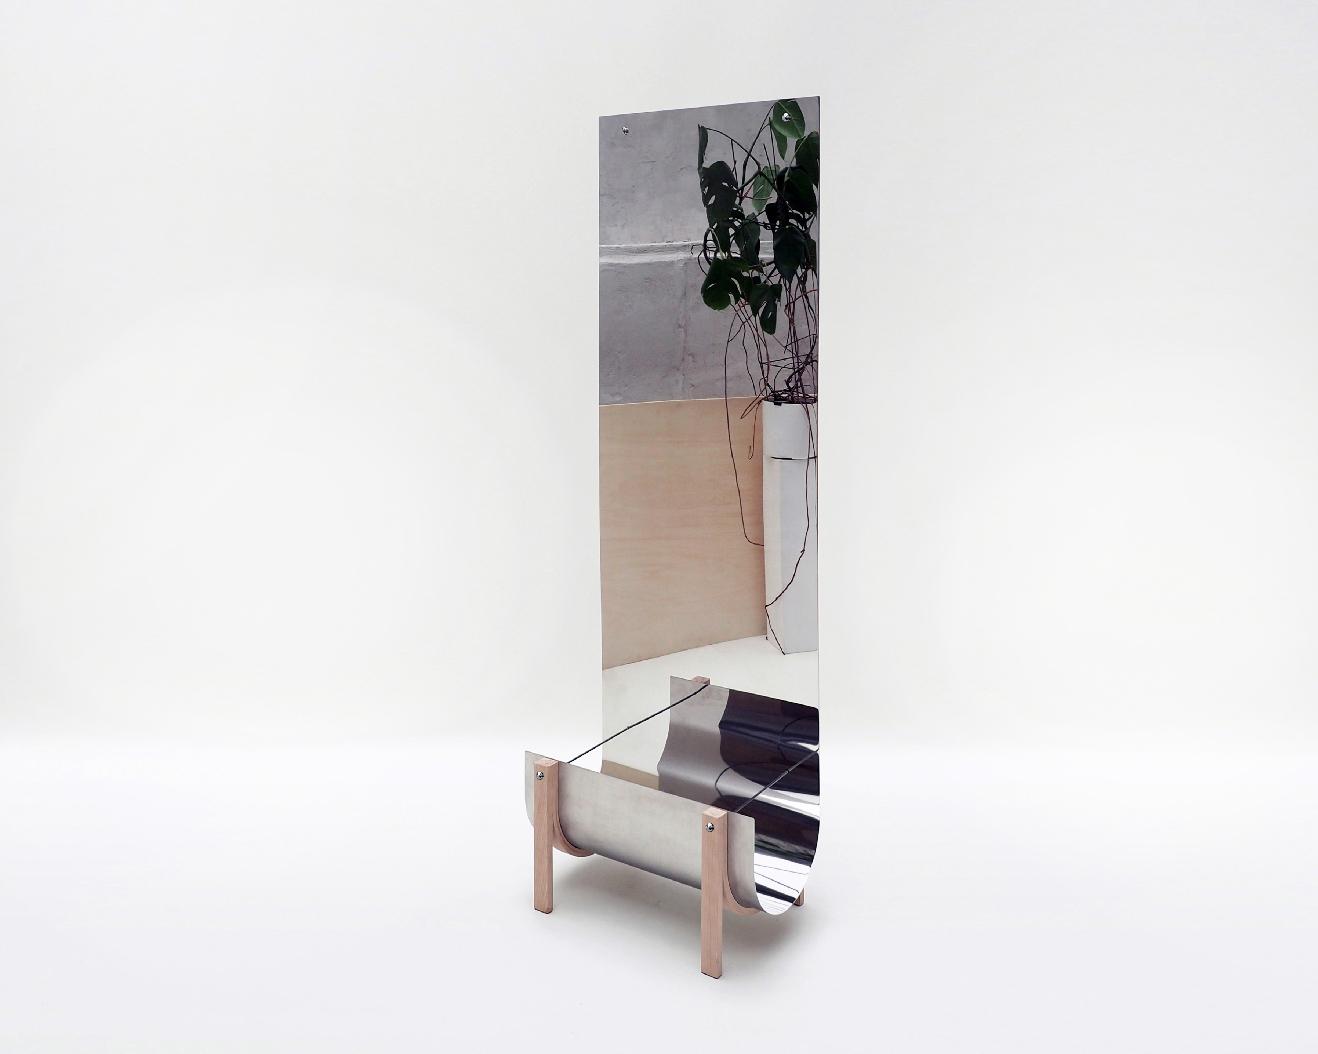 Miroir-GM-Frederic-Saulou-Design-1